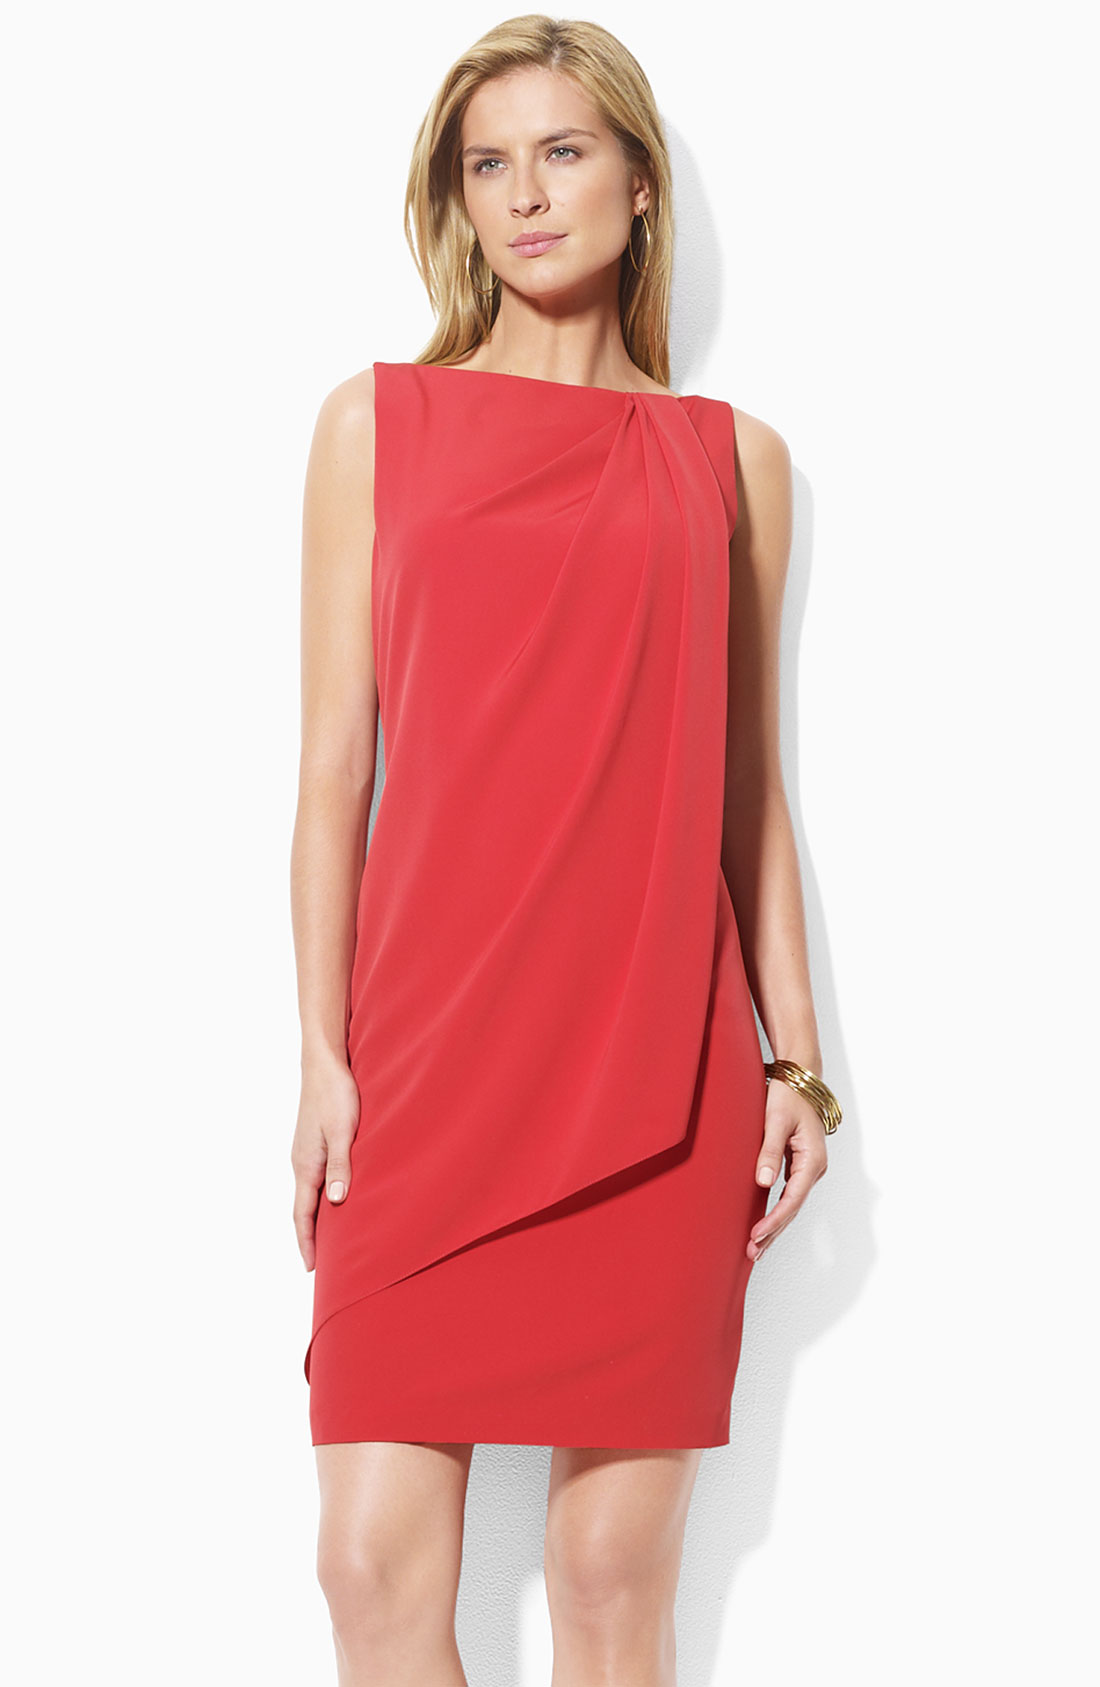 Lauren By Ralph Lauren Sleeveless Drape Front Dress In Red